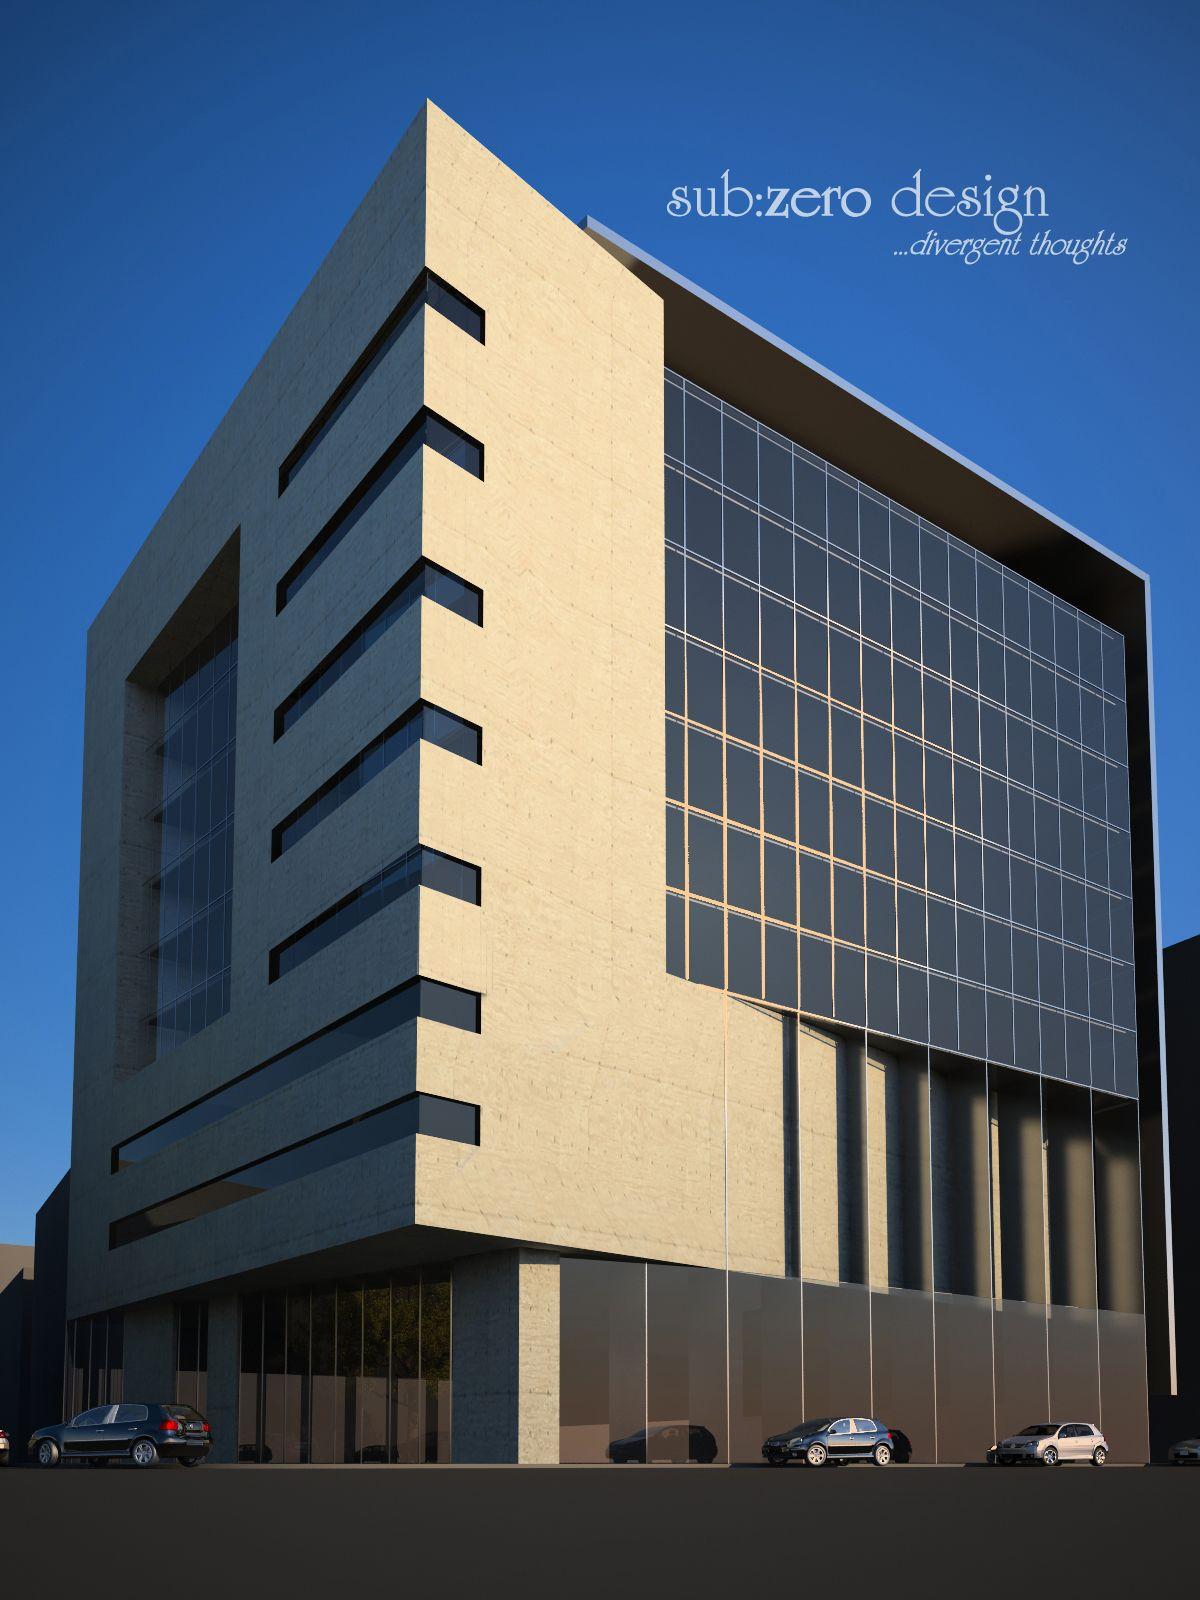 office building design concepts. Concepts For An Office Building Design. Which One Do You Like Best? Design S